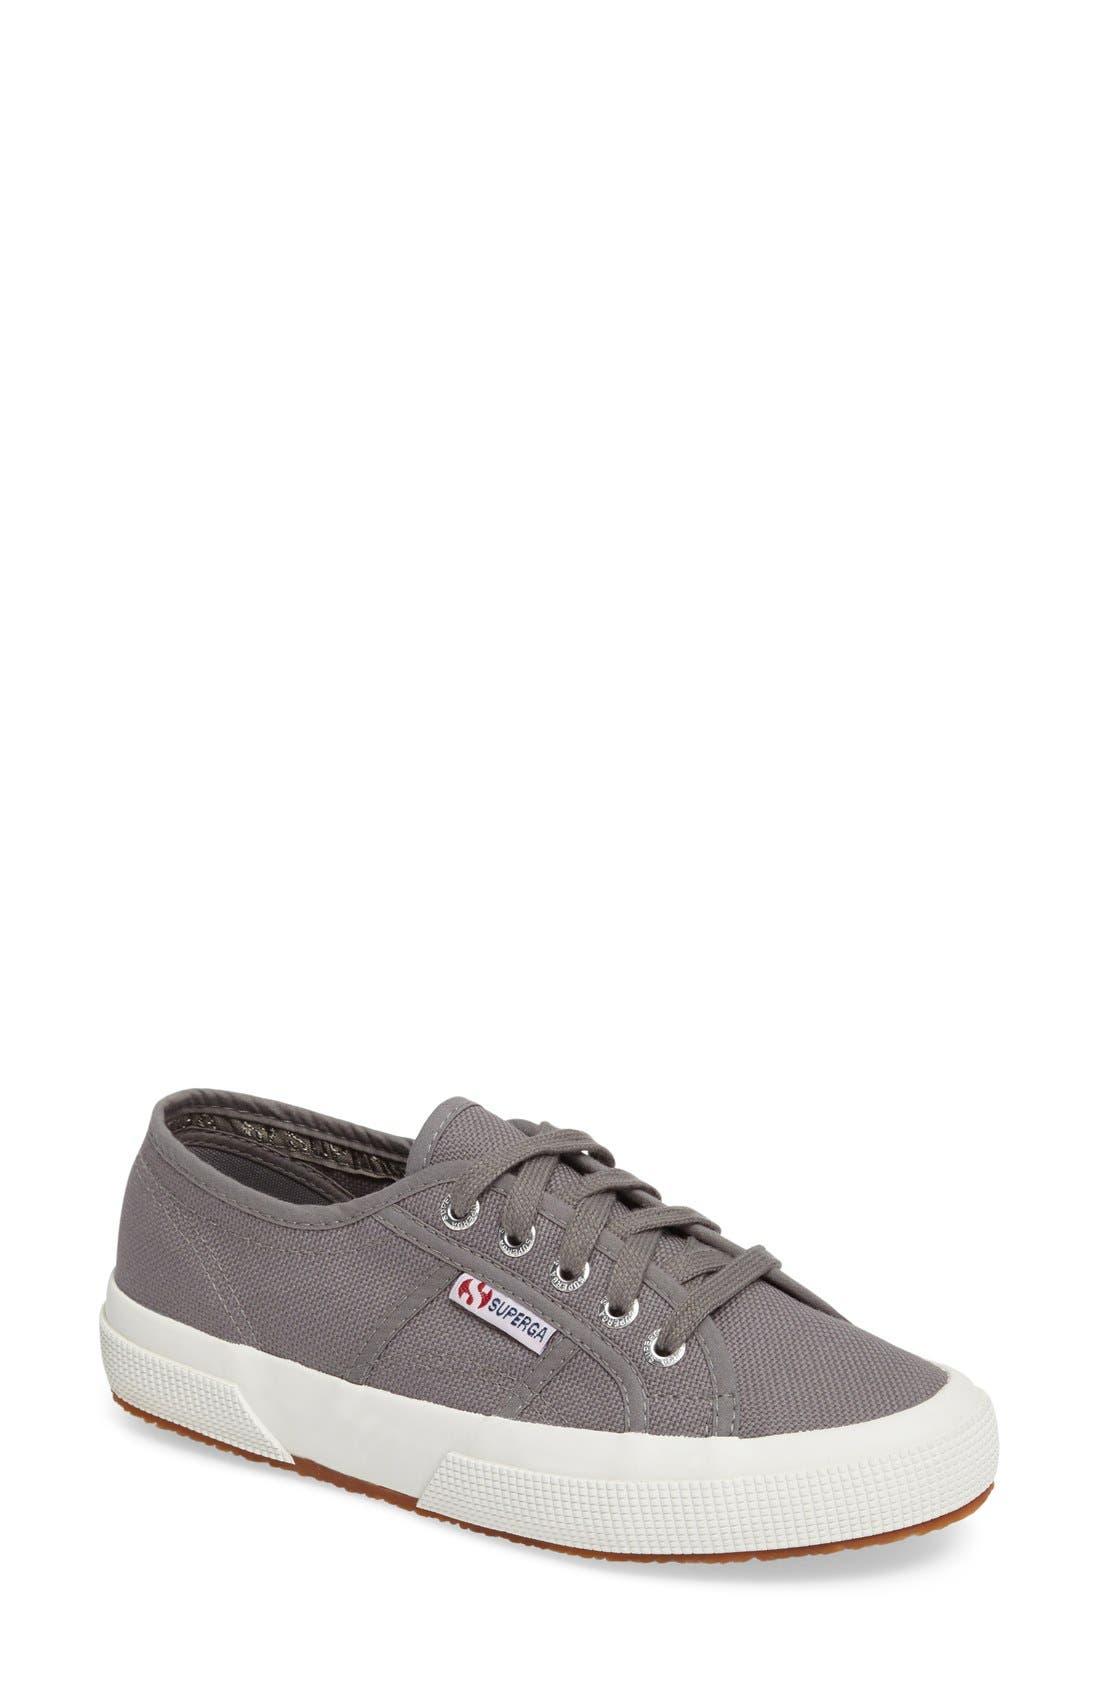 'Cotu' Sneaker,                             Main thumbnail 1, color,                             Grey Sage Canvas